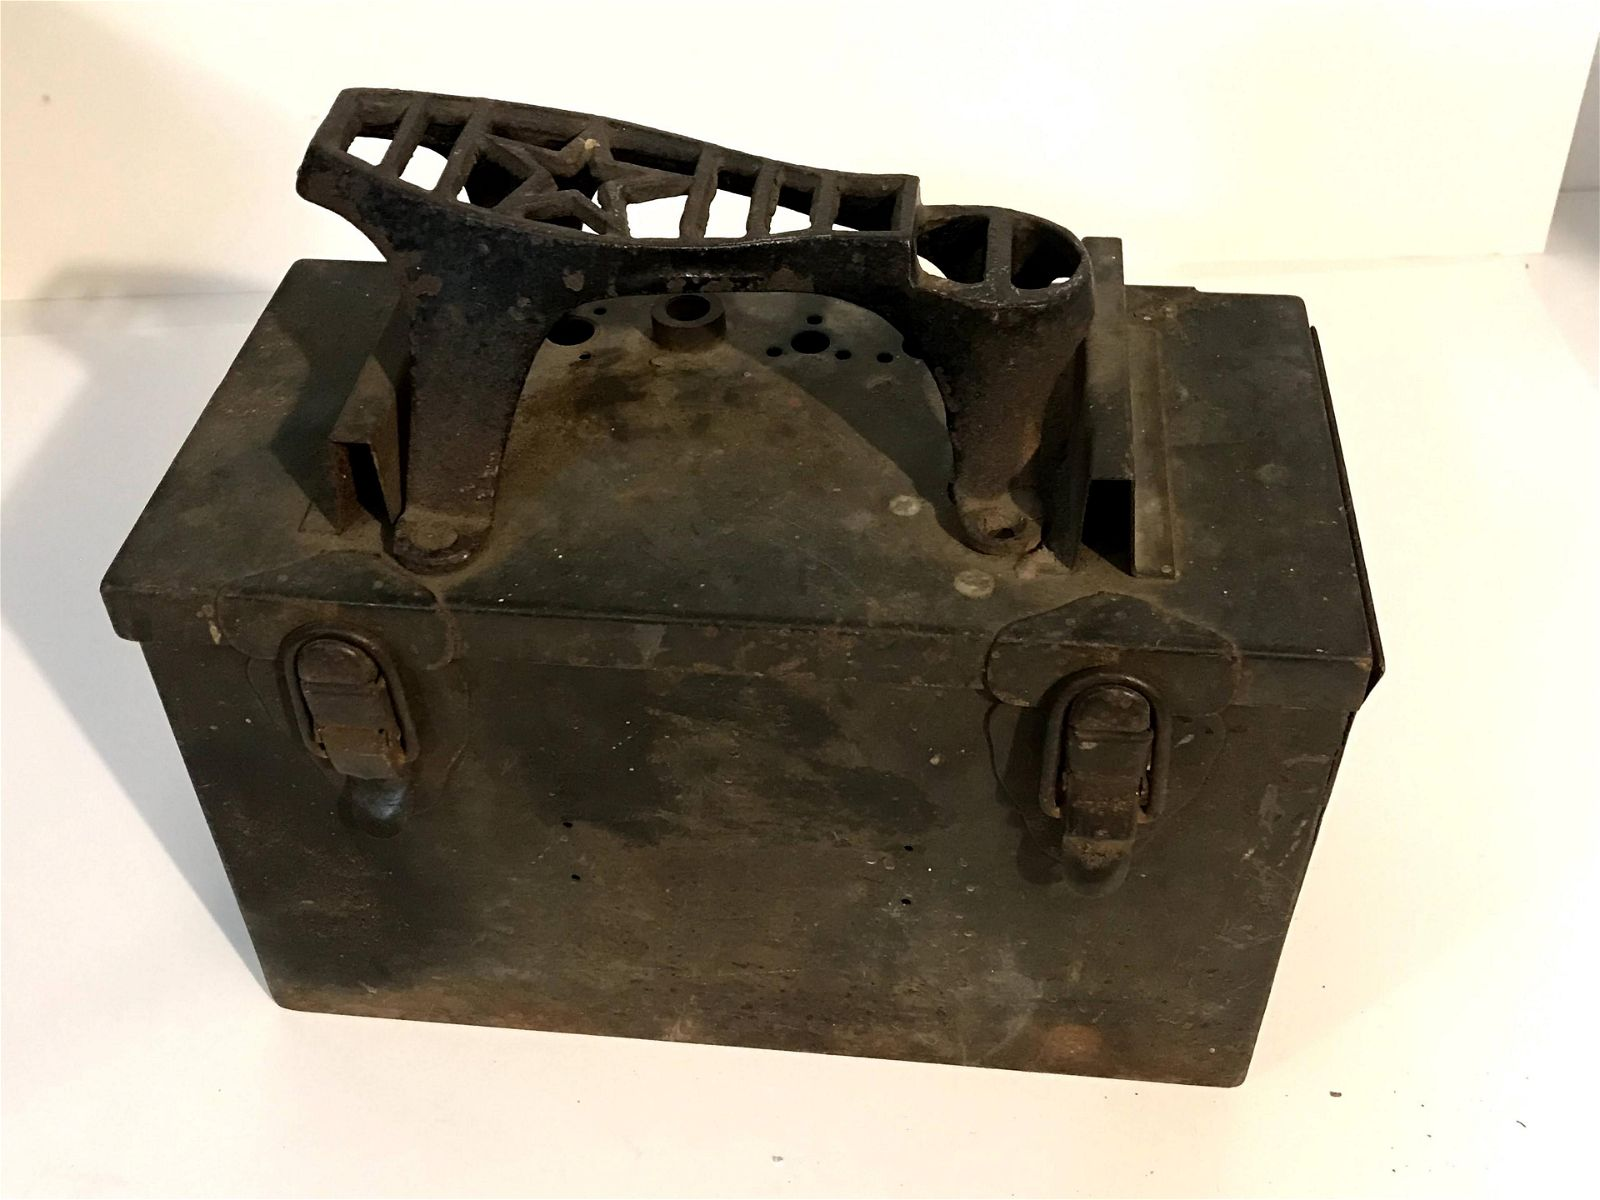 Trench Art WW2 US Army .50 Cal Ammo Box Shoe Shine